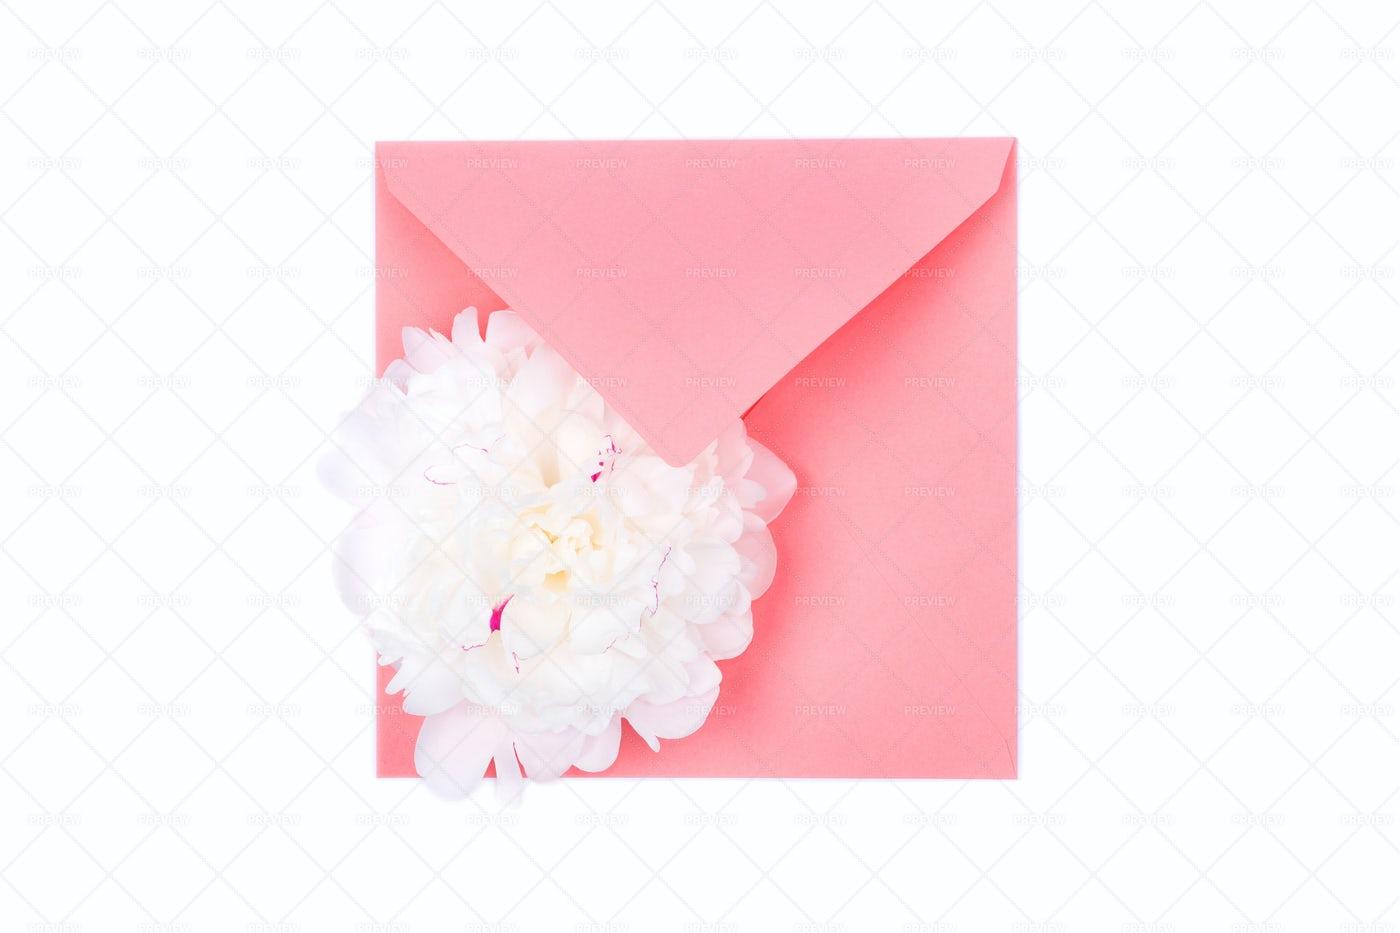 White Flower On A Pink Envelope: Stock Photos